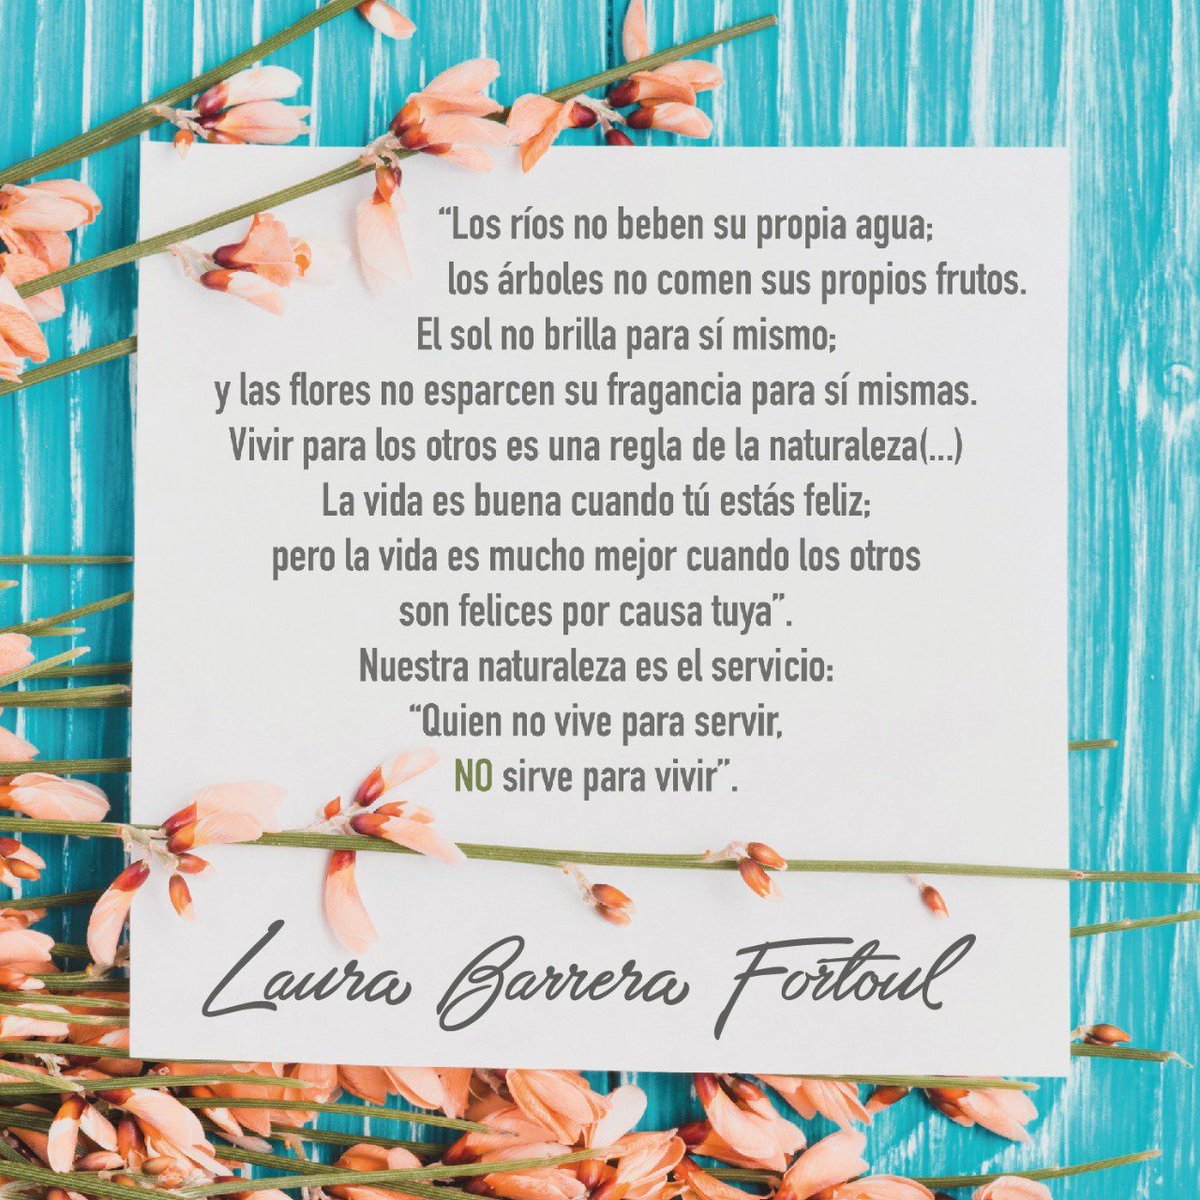 Laura Barrera Fortoul Op Twitter Les Deseo Un Muy Bonito